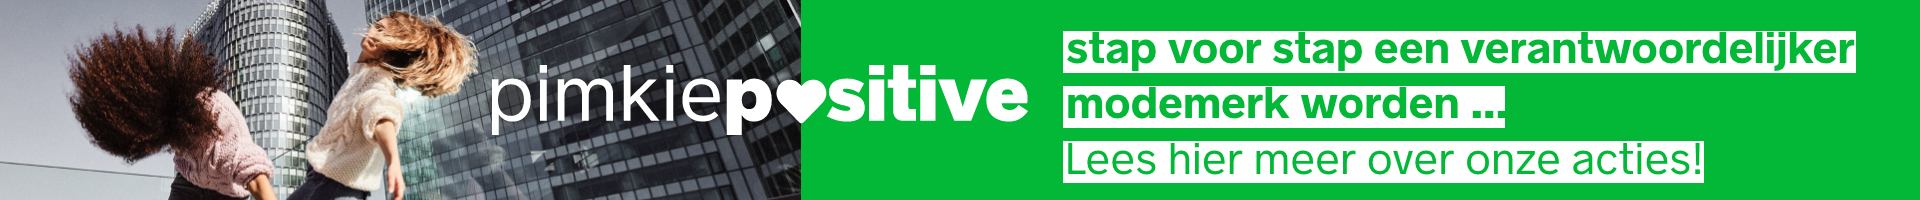 pimkie positive